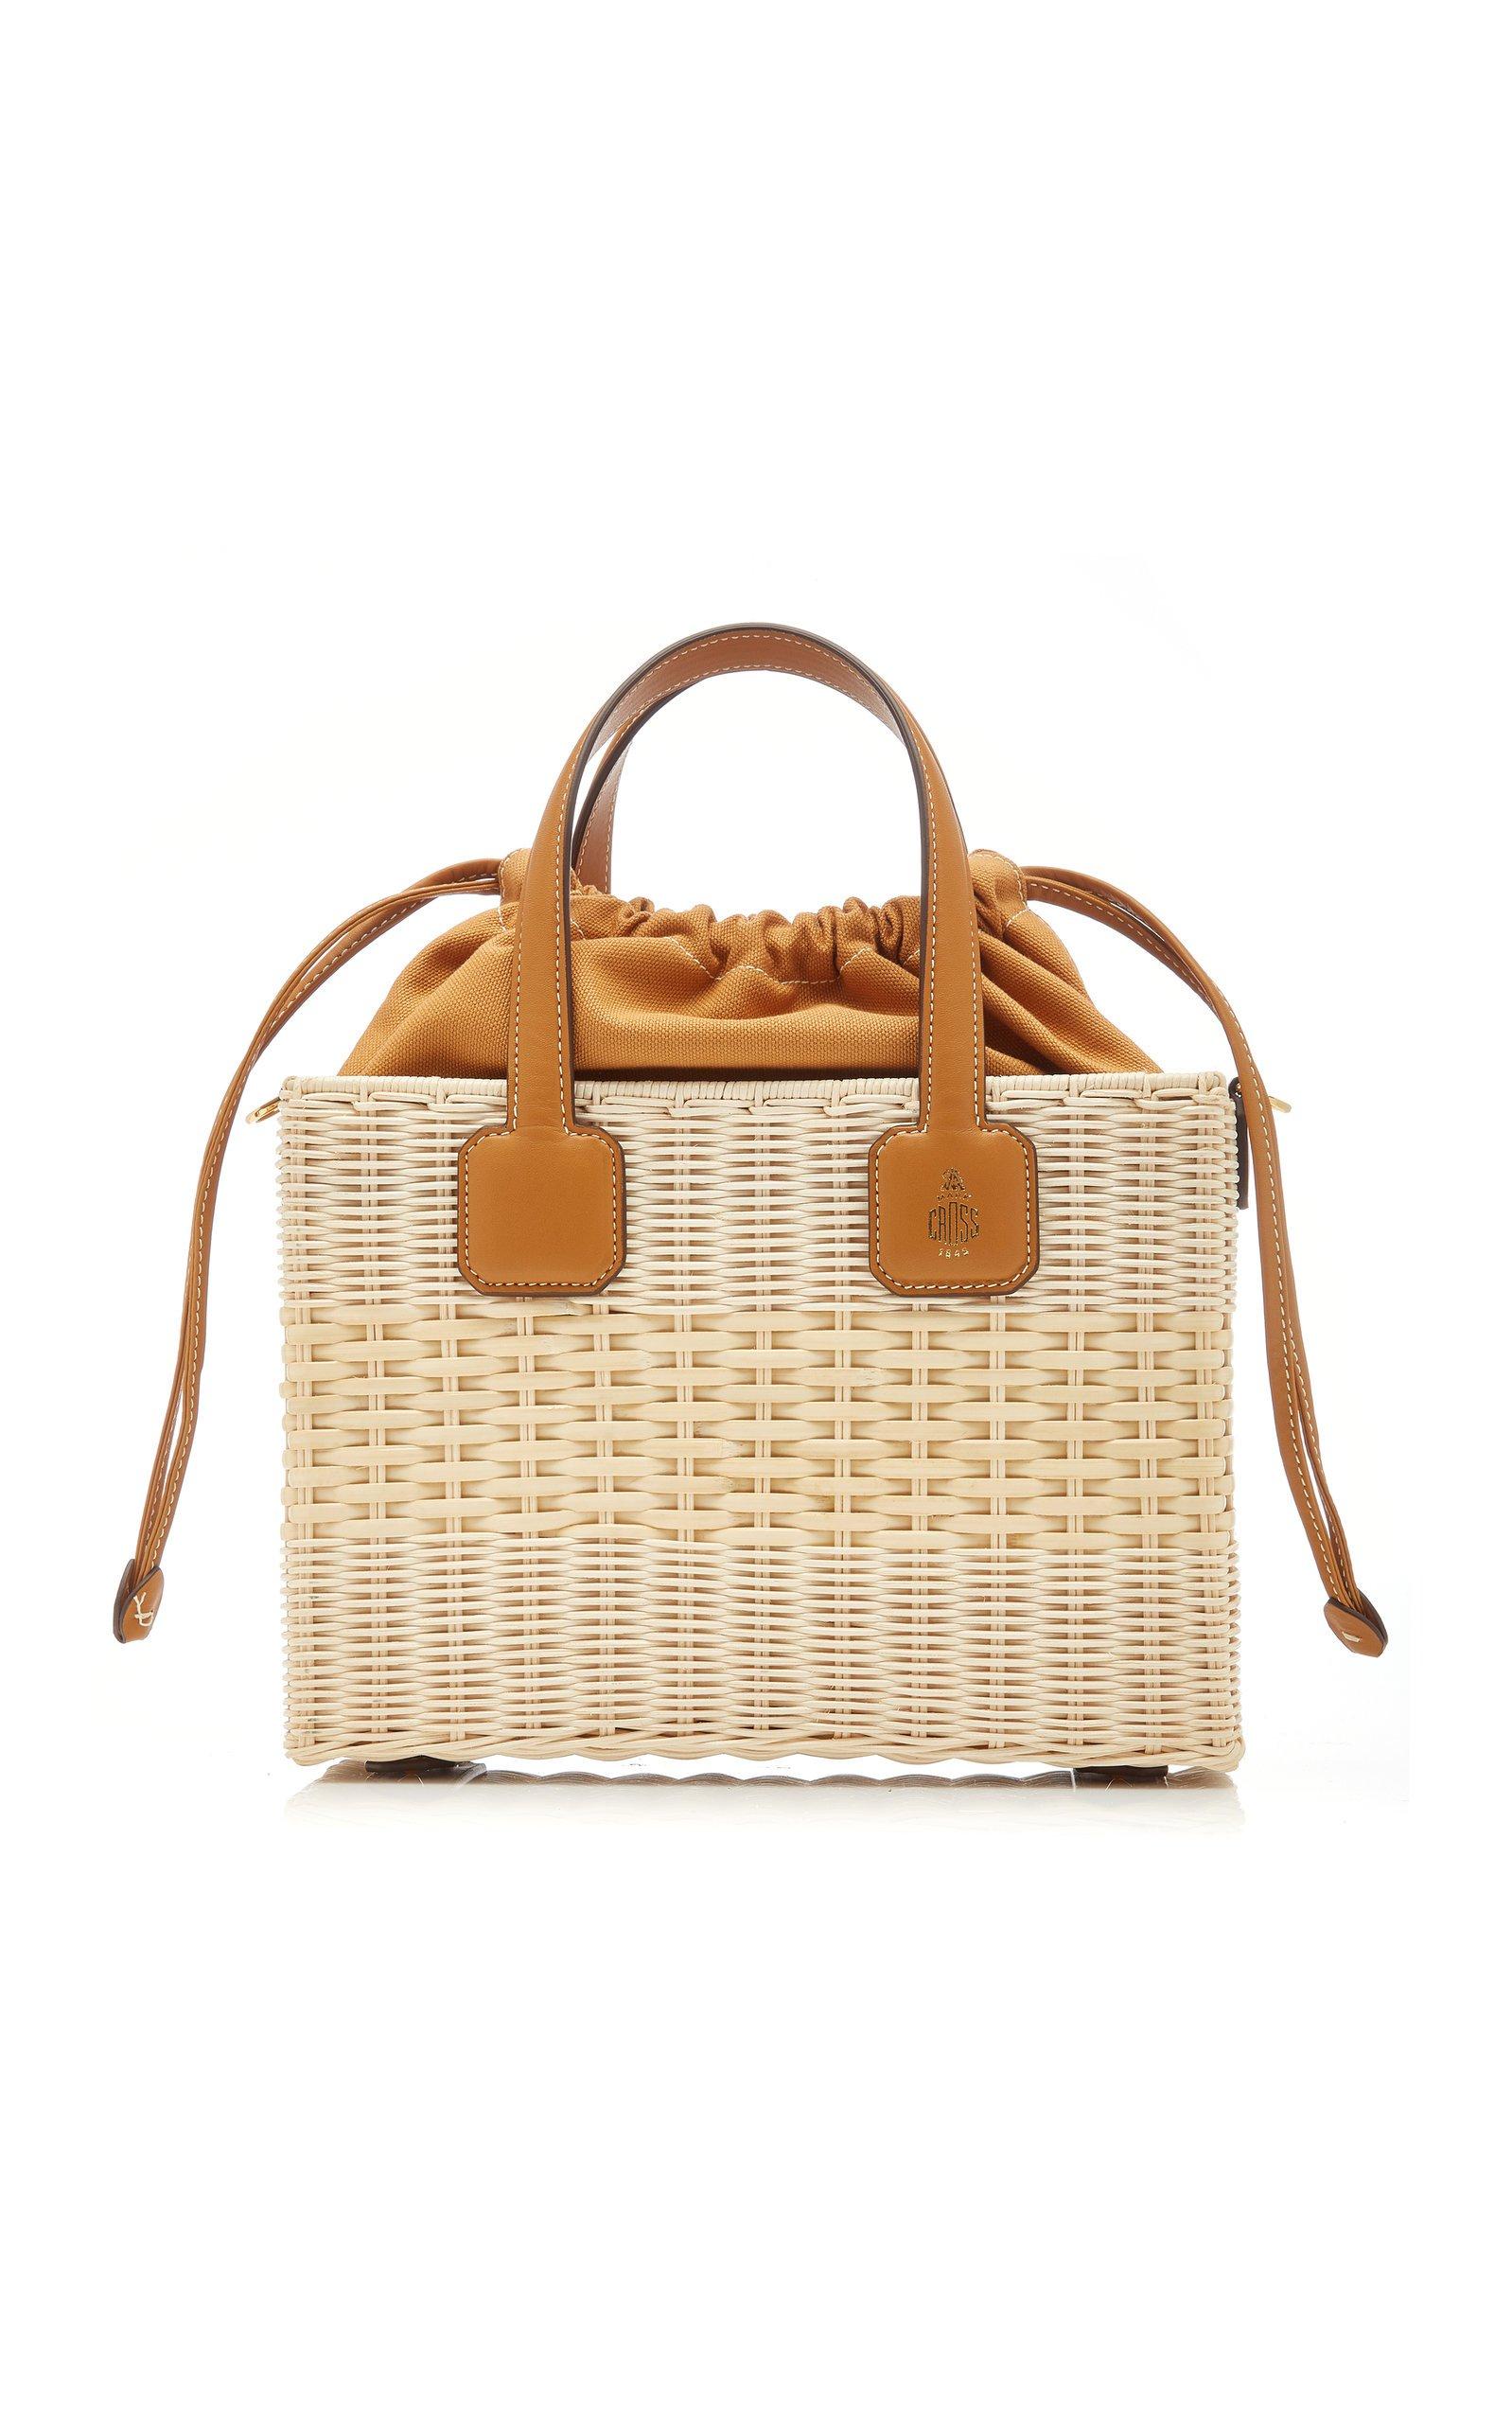 Mark Cross Manray Small Top Handle Bag